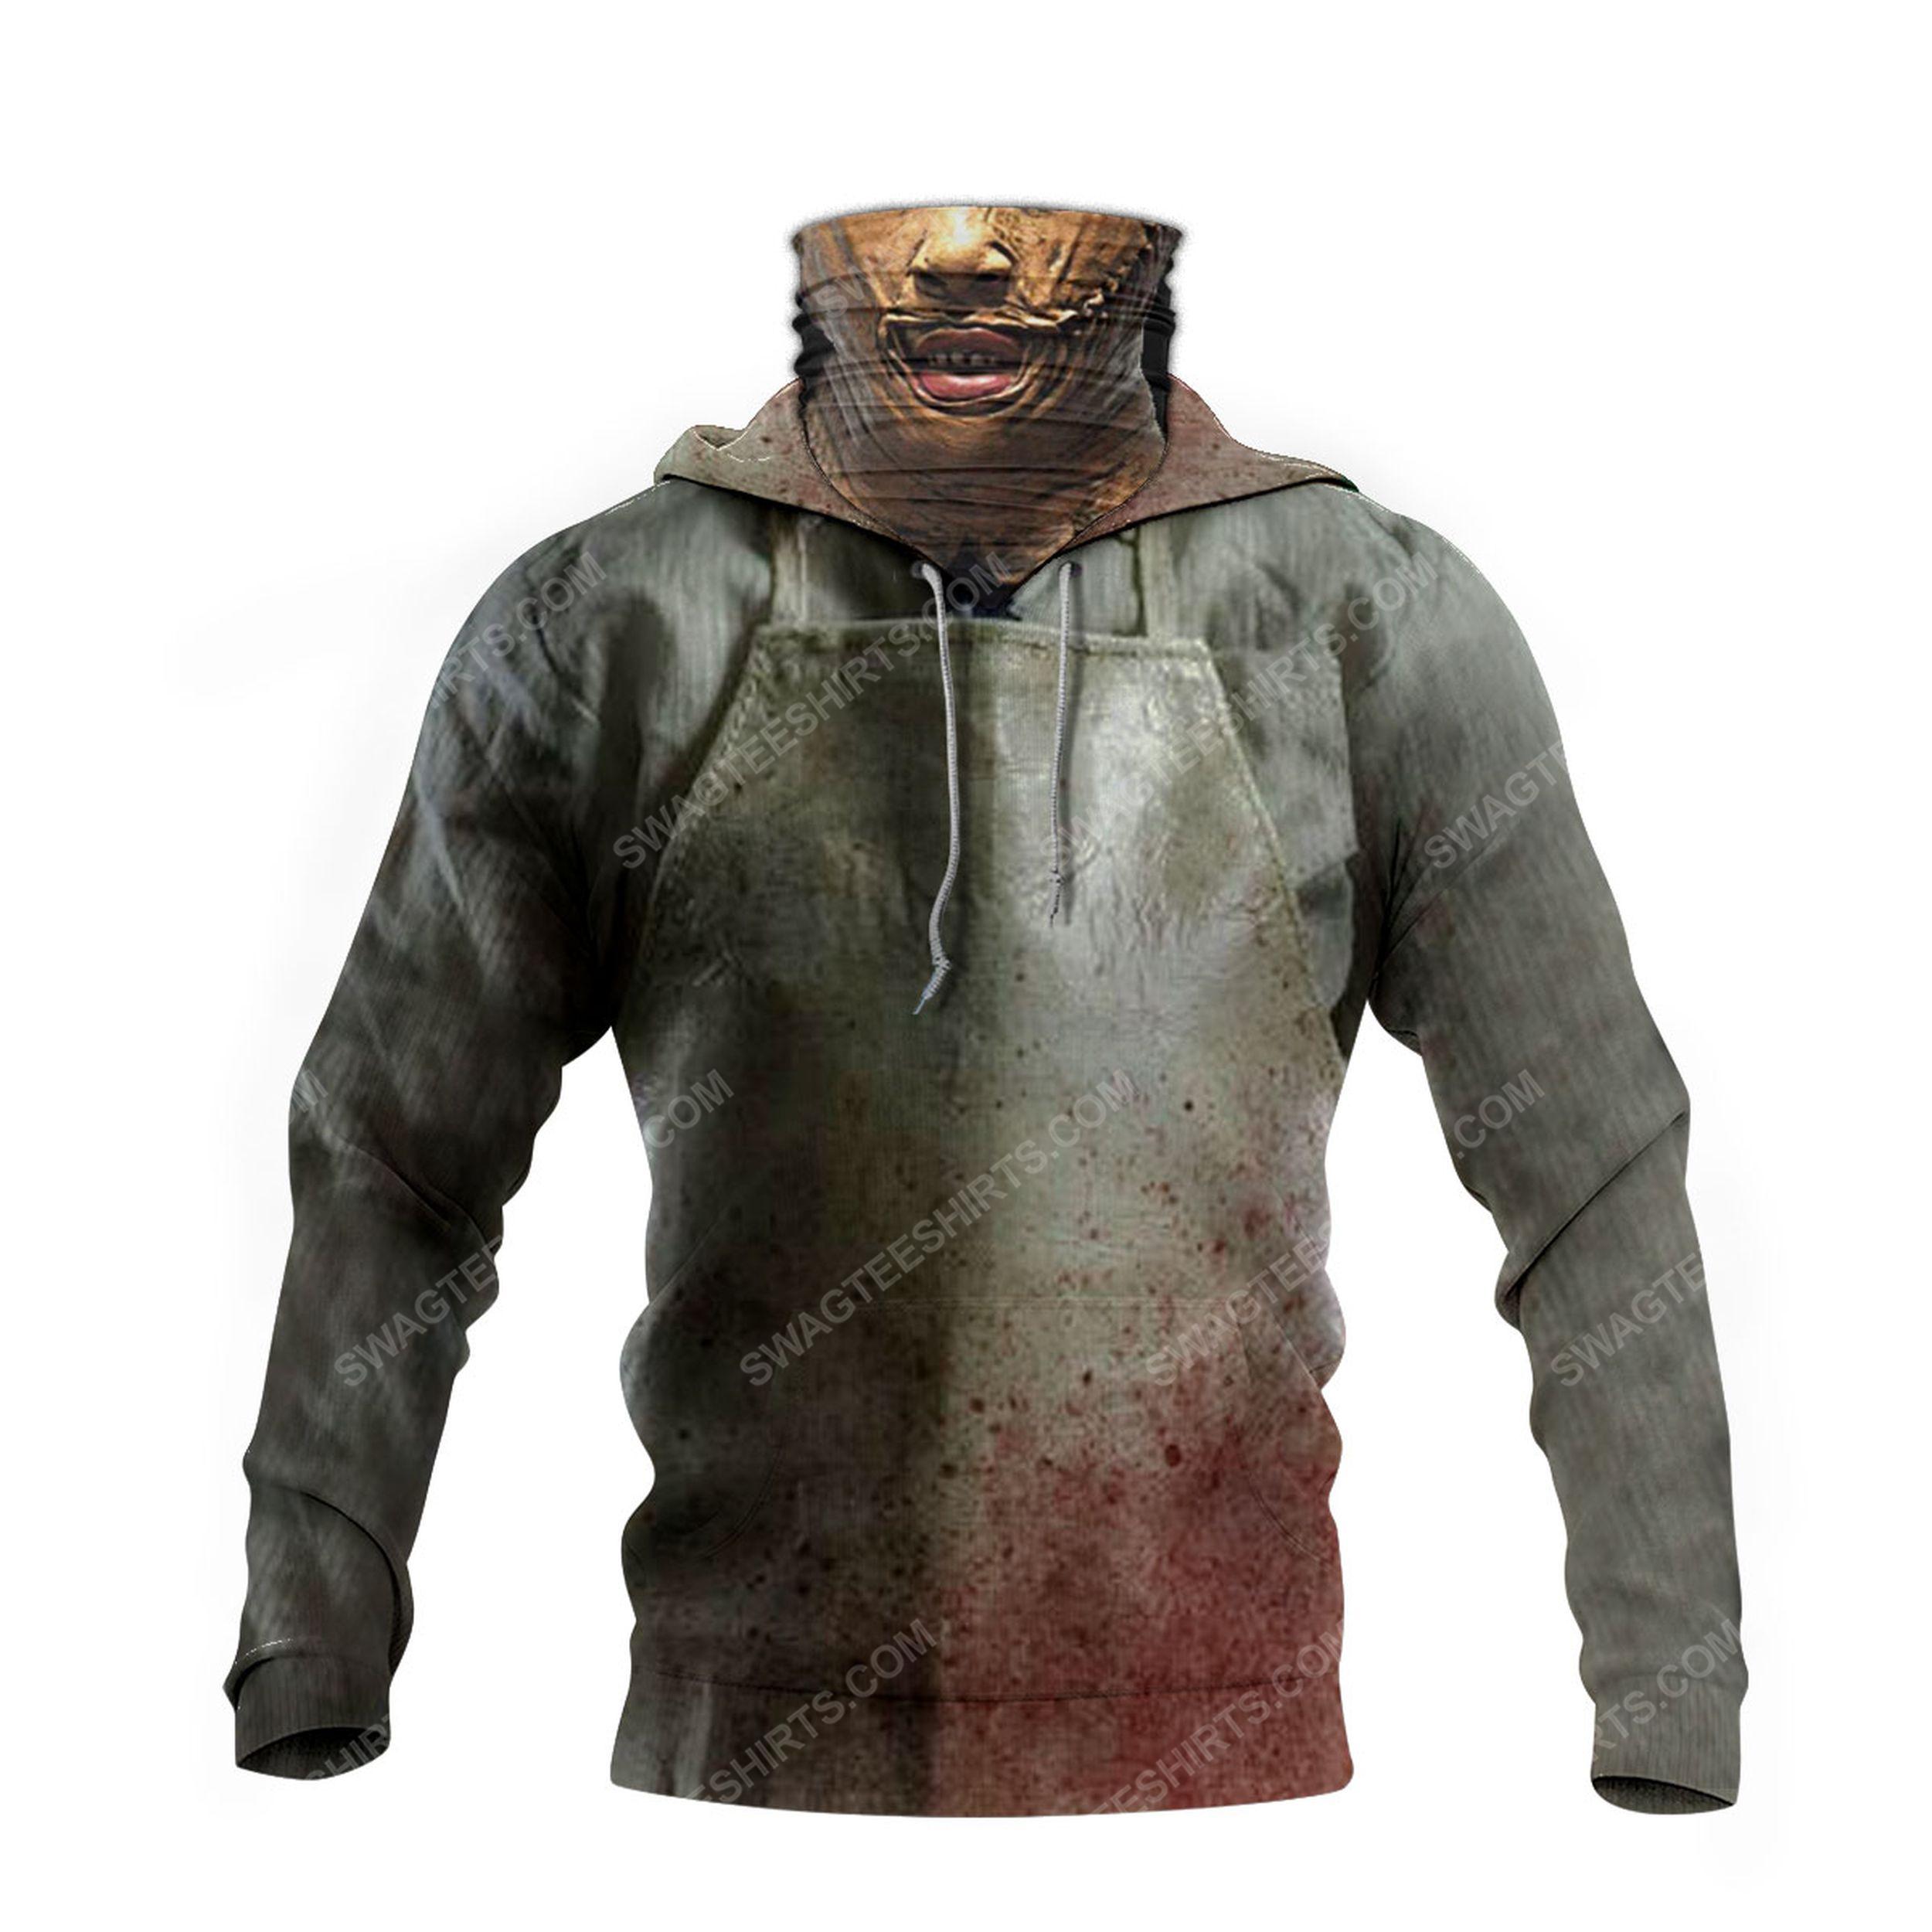 Horror movie leatherface for halloween full print mask hoodie 4(1)